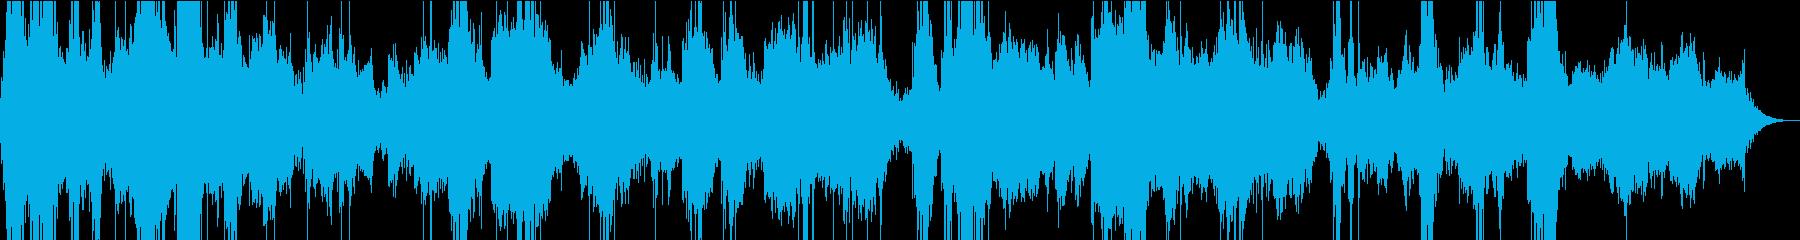 Fractal Atmosphereの再生済みの波形